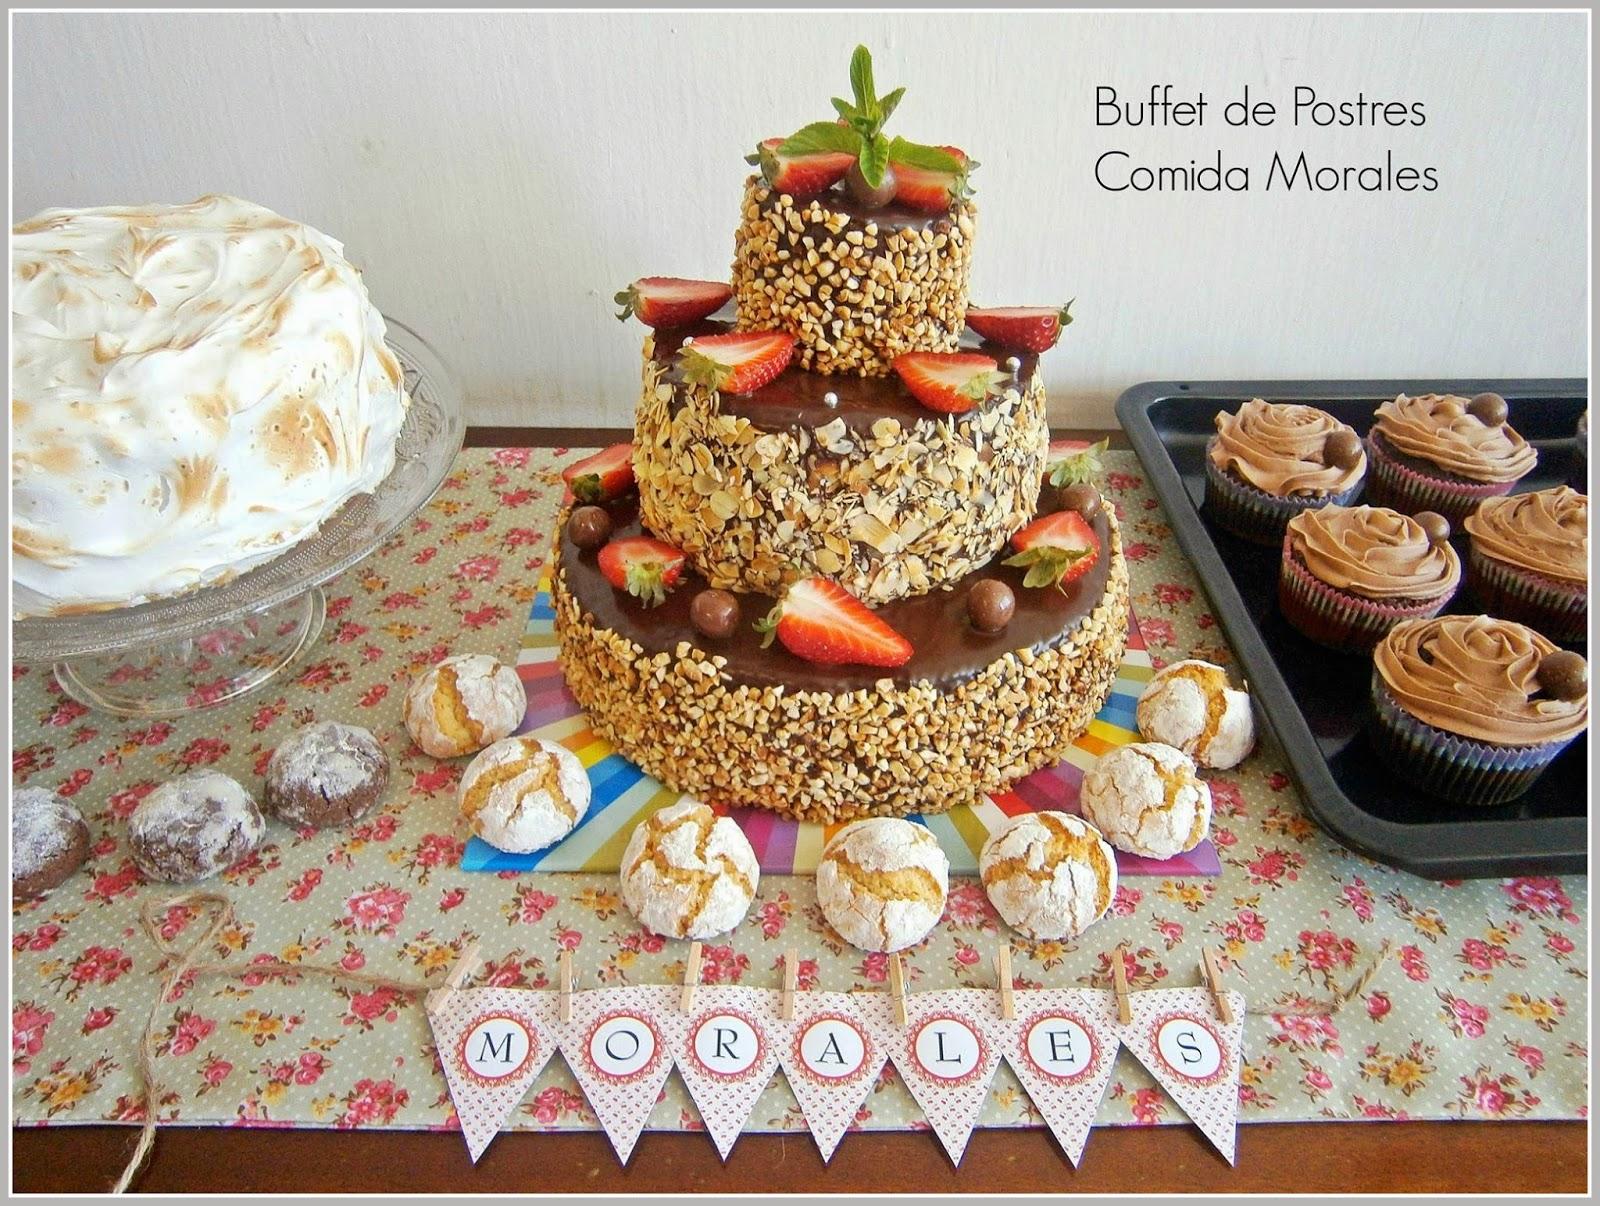 La cocina de los inventos buffet de postres comida familiar for La cocina de lechuza postres